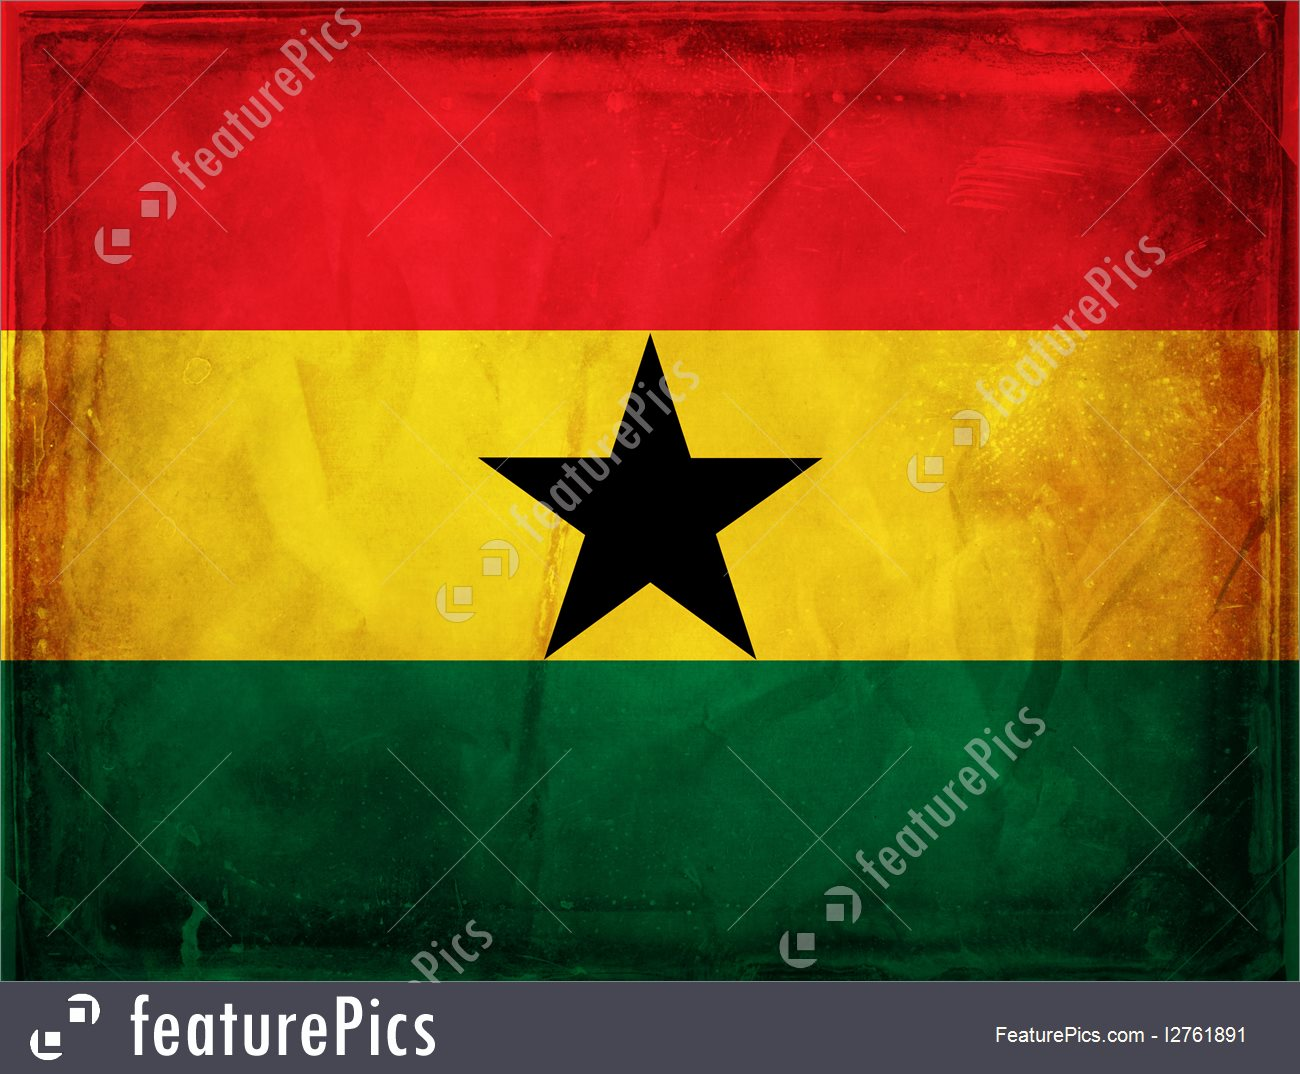 HQ Flag Of Ghana Wallpapers | File 201.5Kb